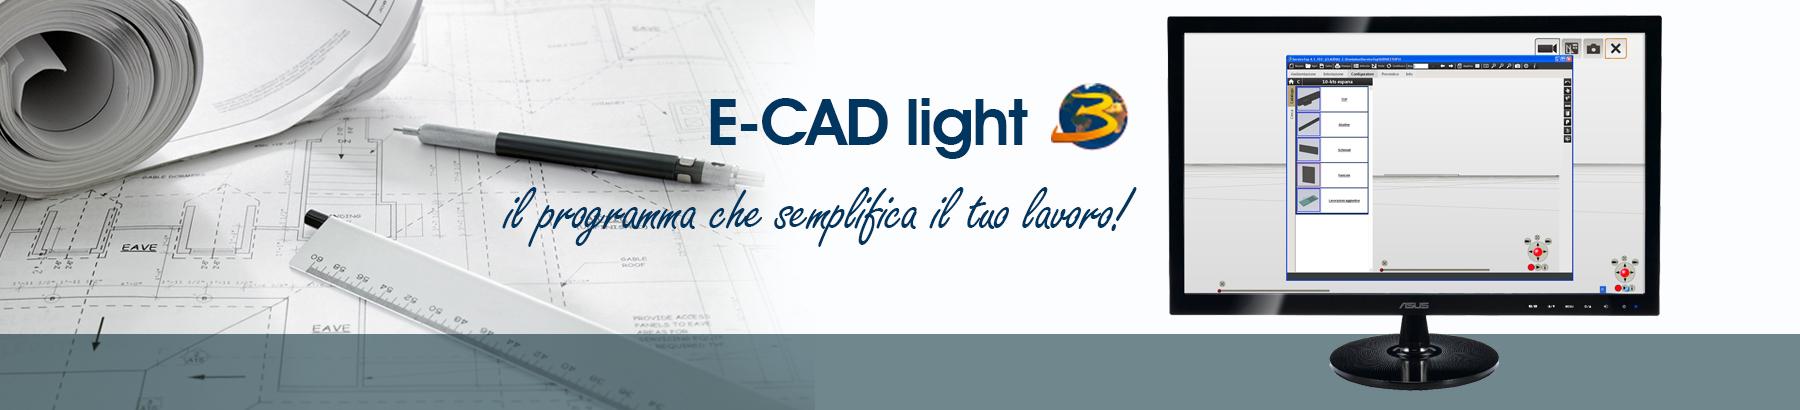 slide-ecad